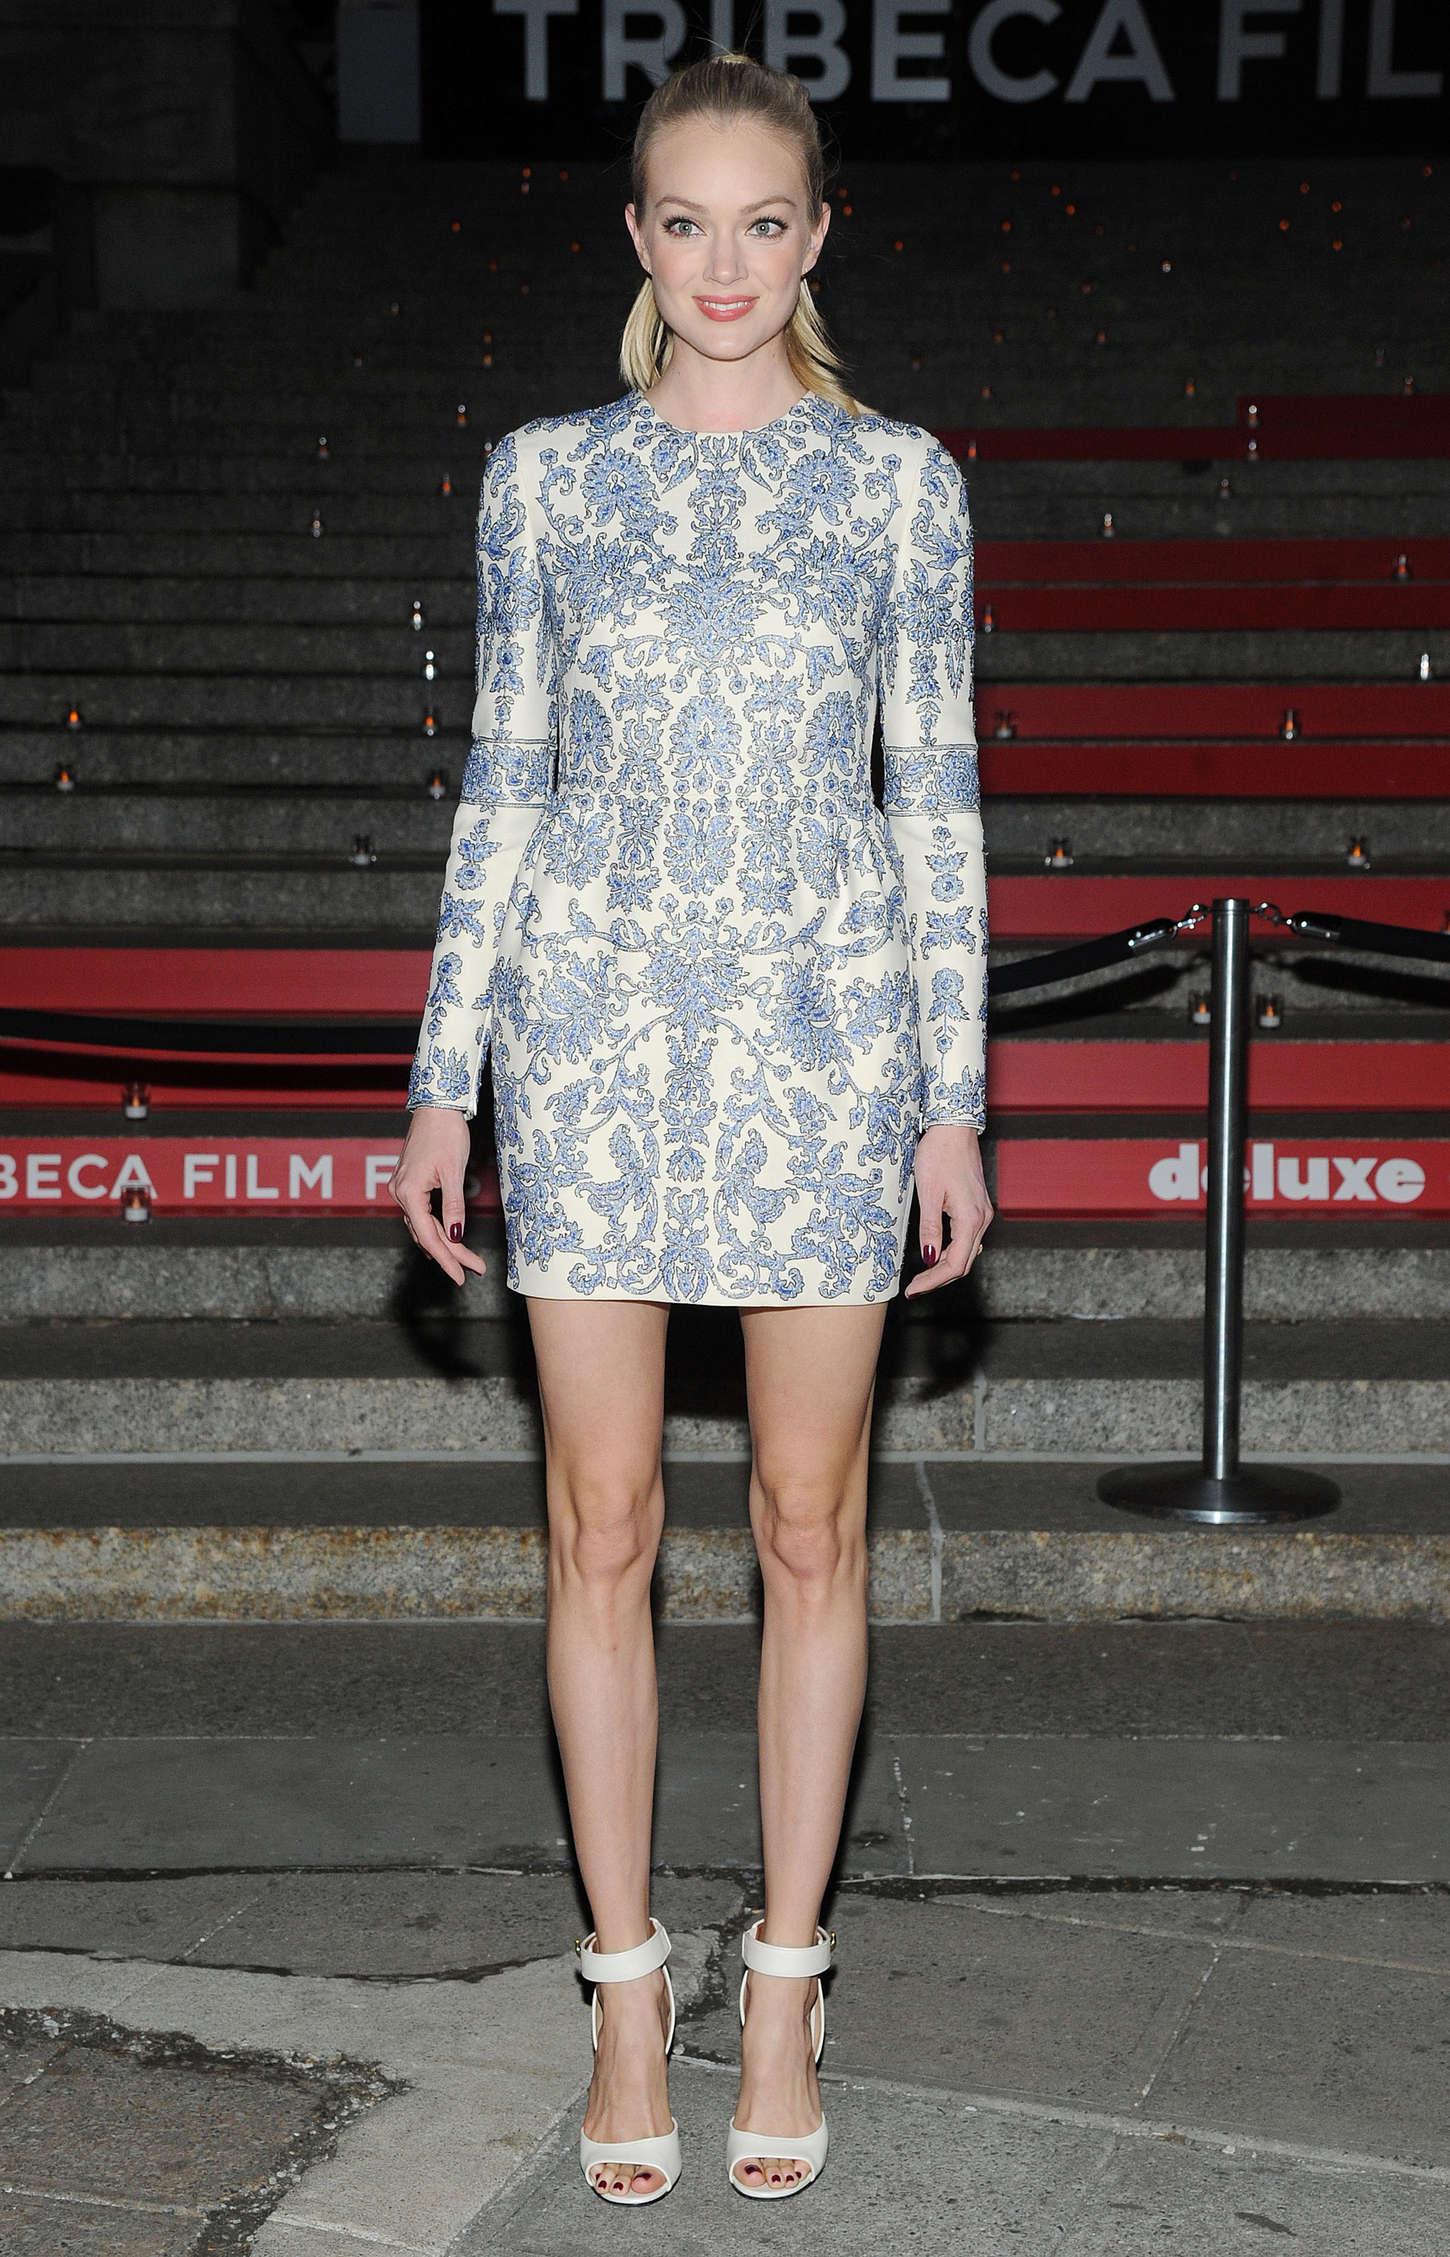 Lindsay Ellingson 2015 : Lindsay Ellingson: Vanity Fair Party 2015 Tribeca Film Festival -01